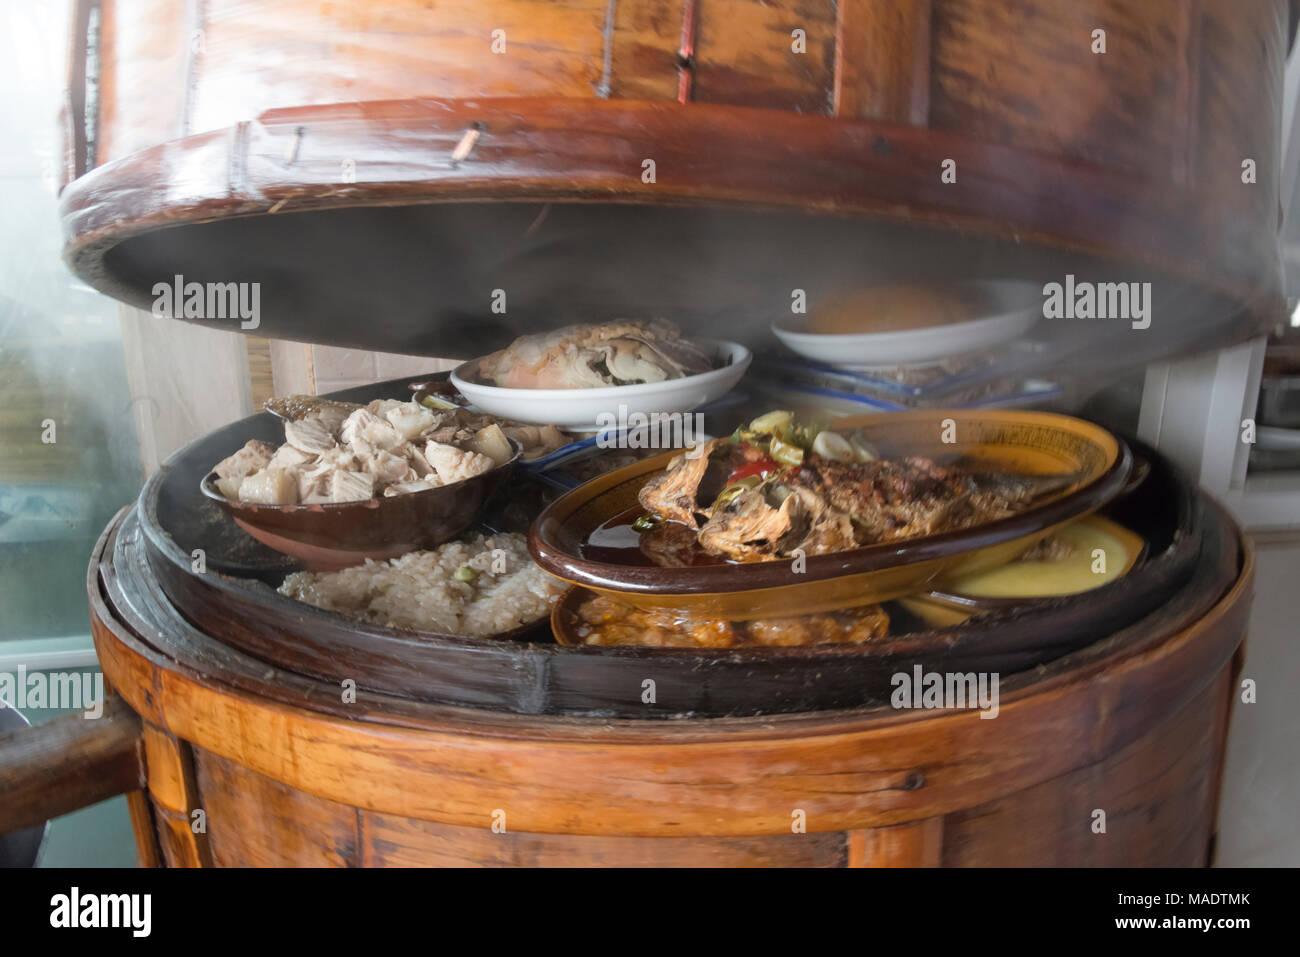 Essen In Bambus Steamer Chengdu Provinz Sichuan China Stockfoto